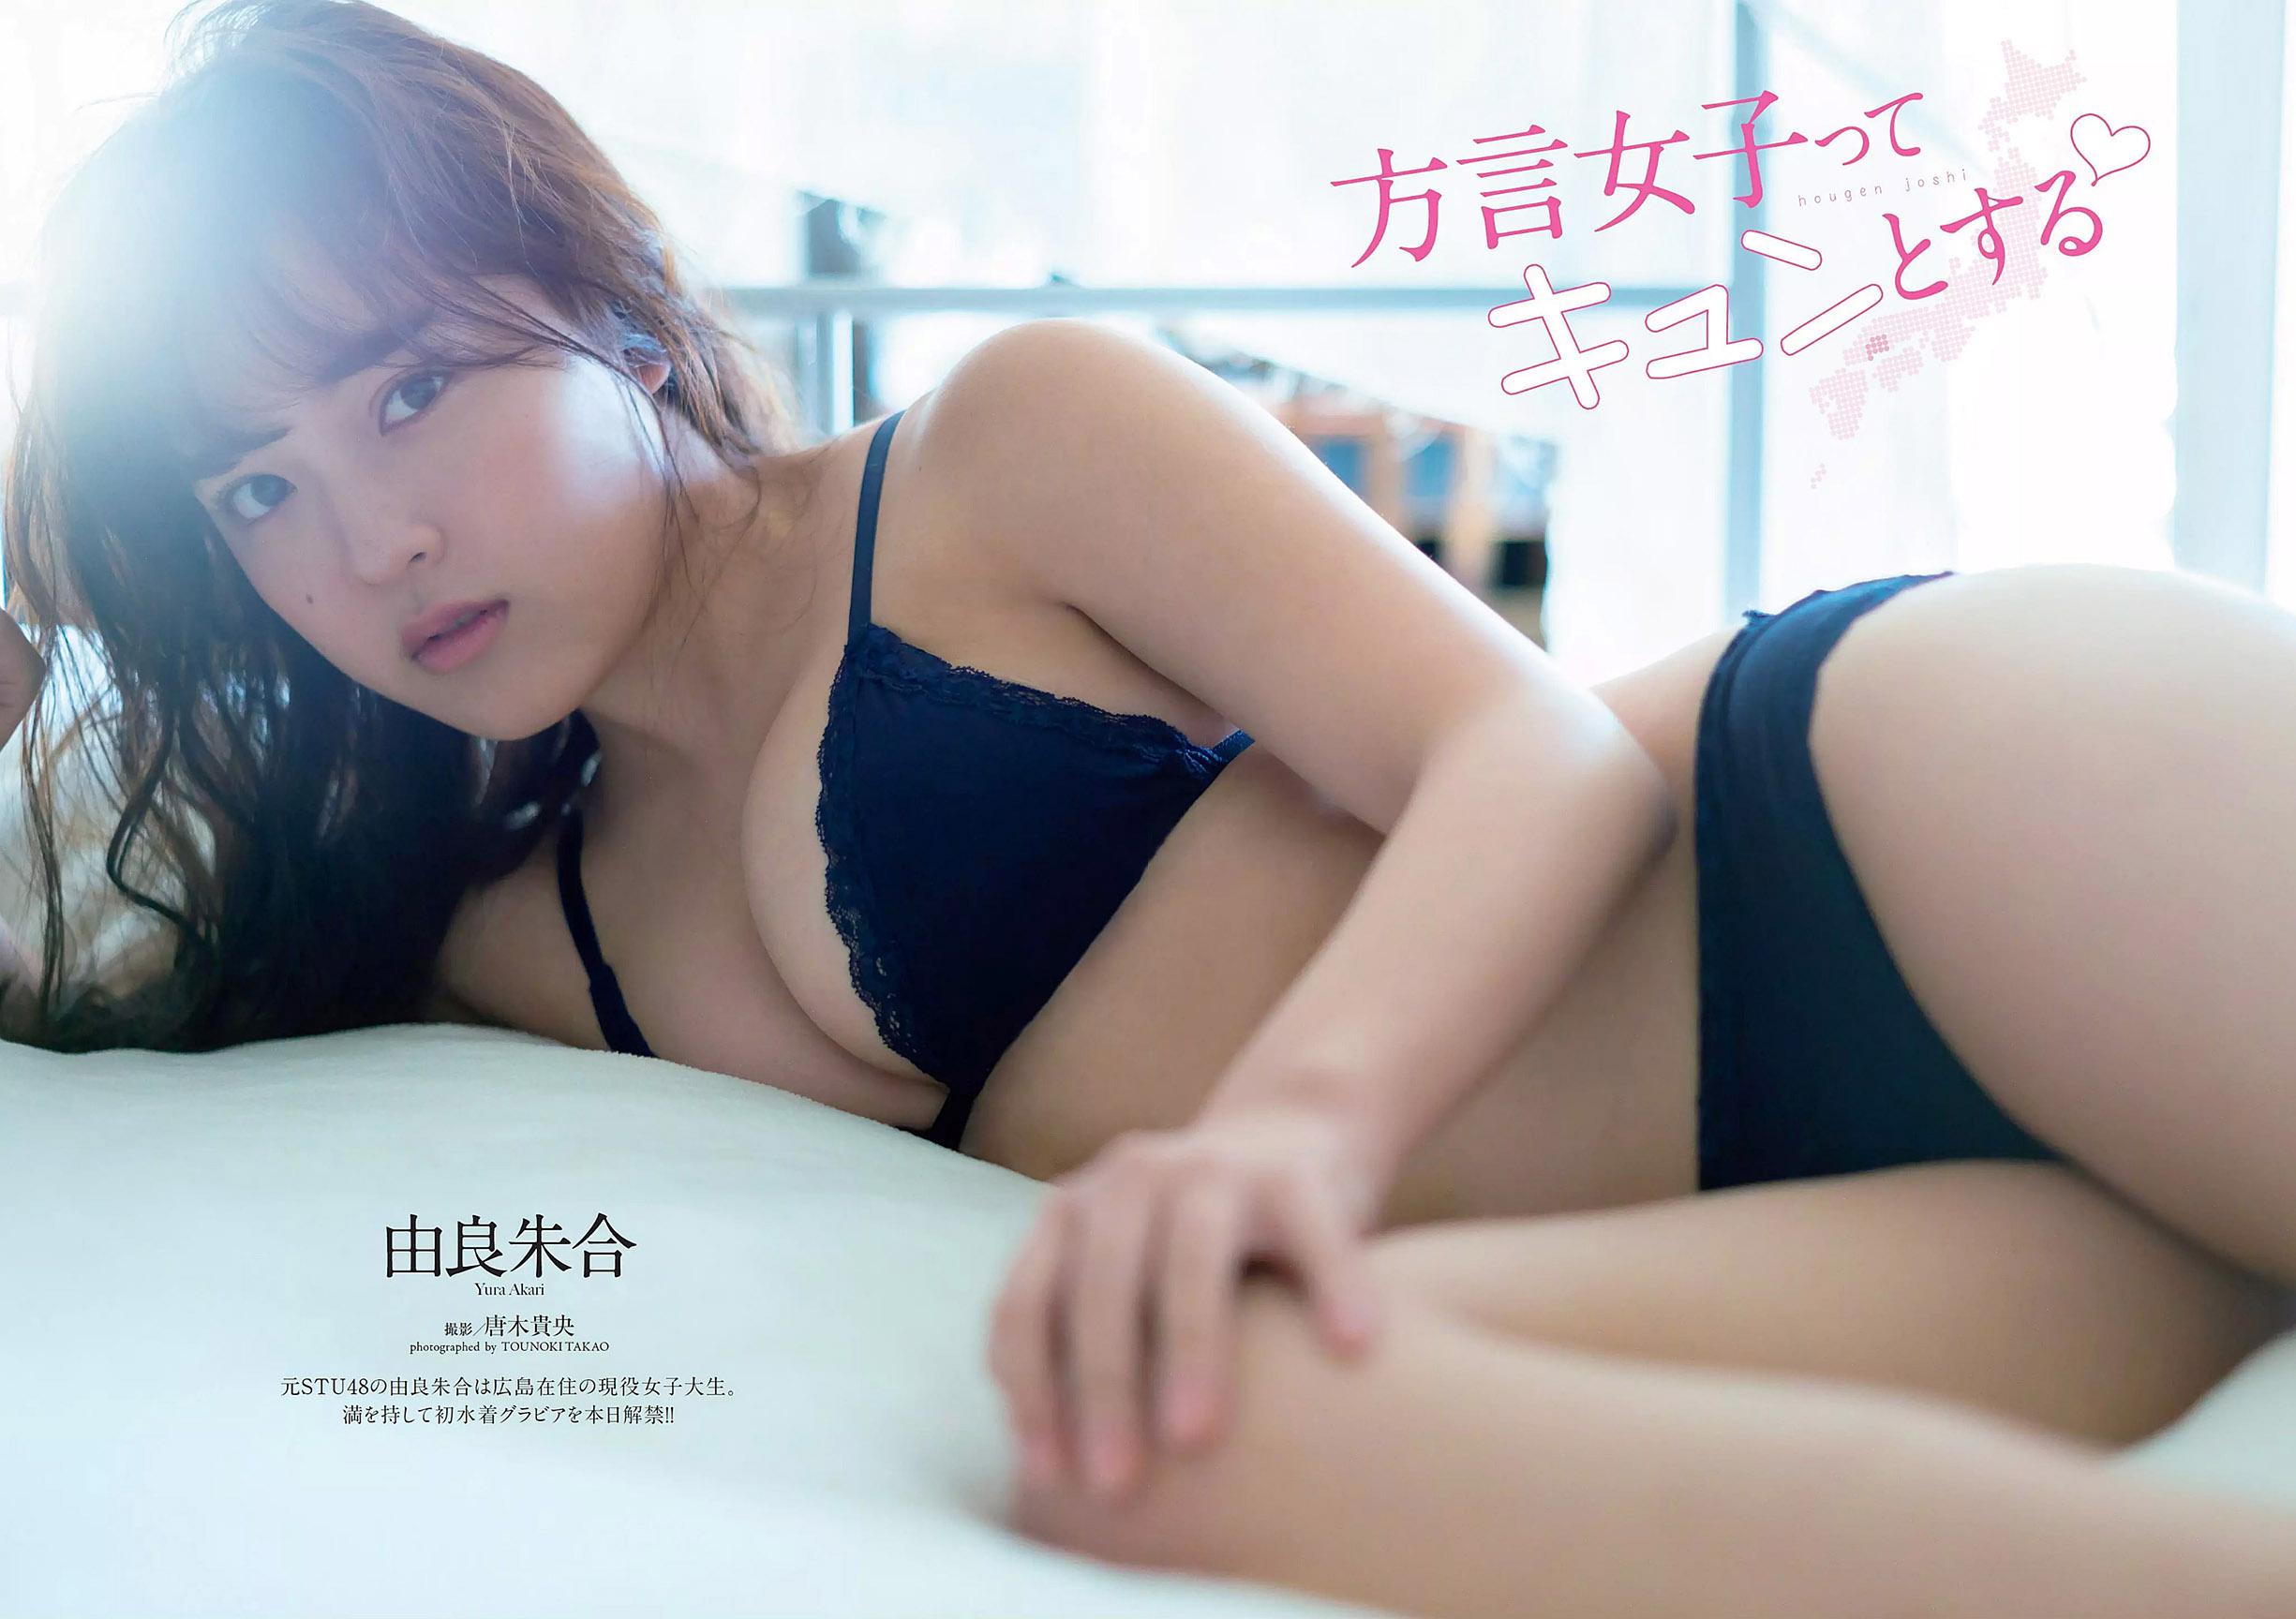 Yura Akari WPB 200601 01.jpg